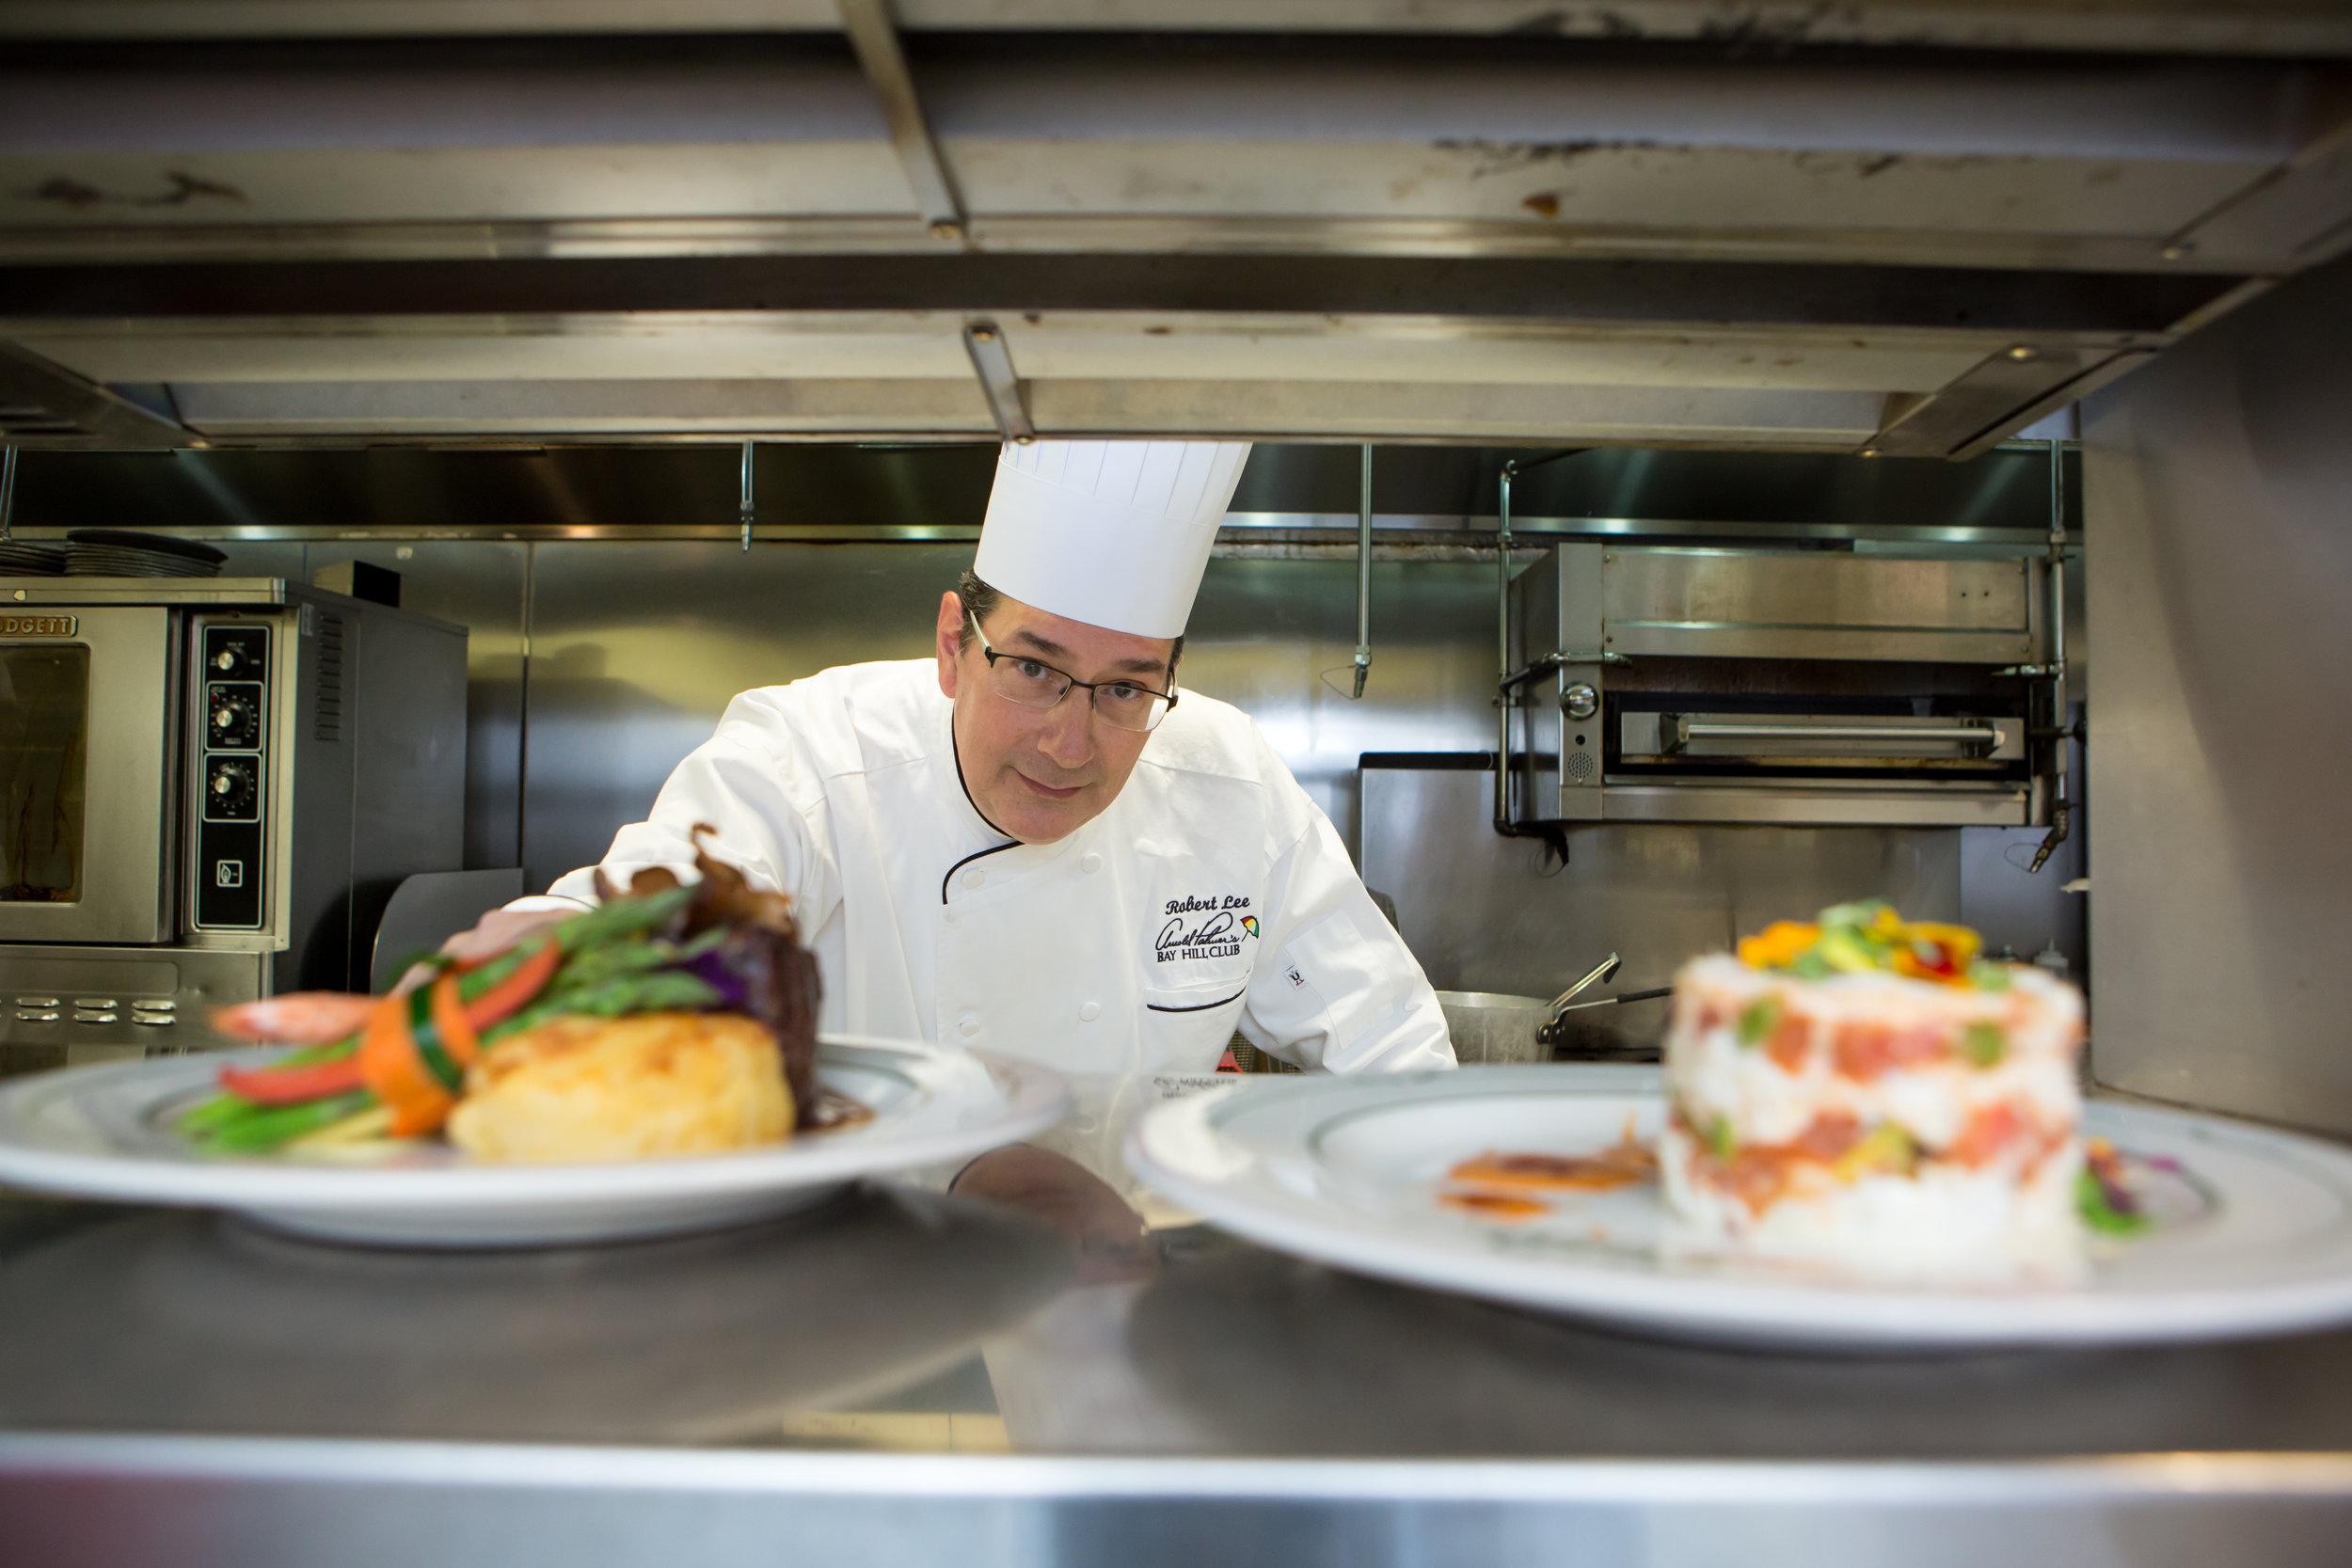 food-photography-chef-portrait-golf-dynamite-studio-kitchen-pass.jpg